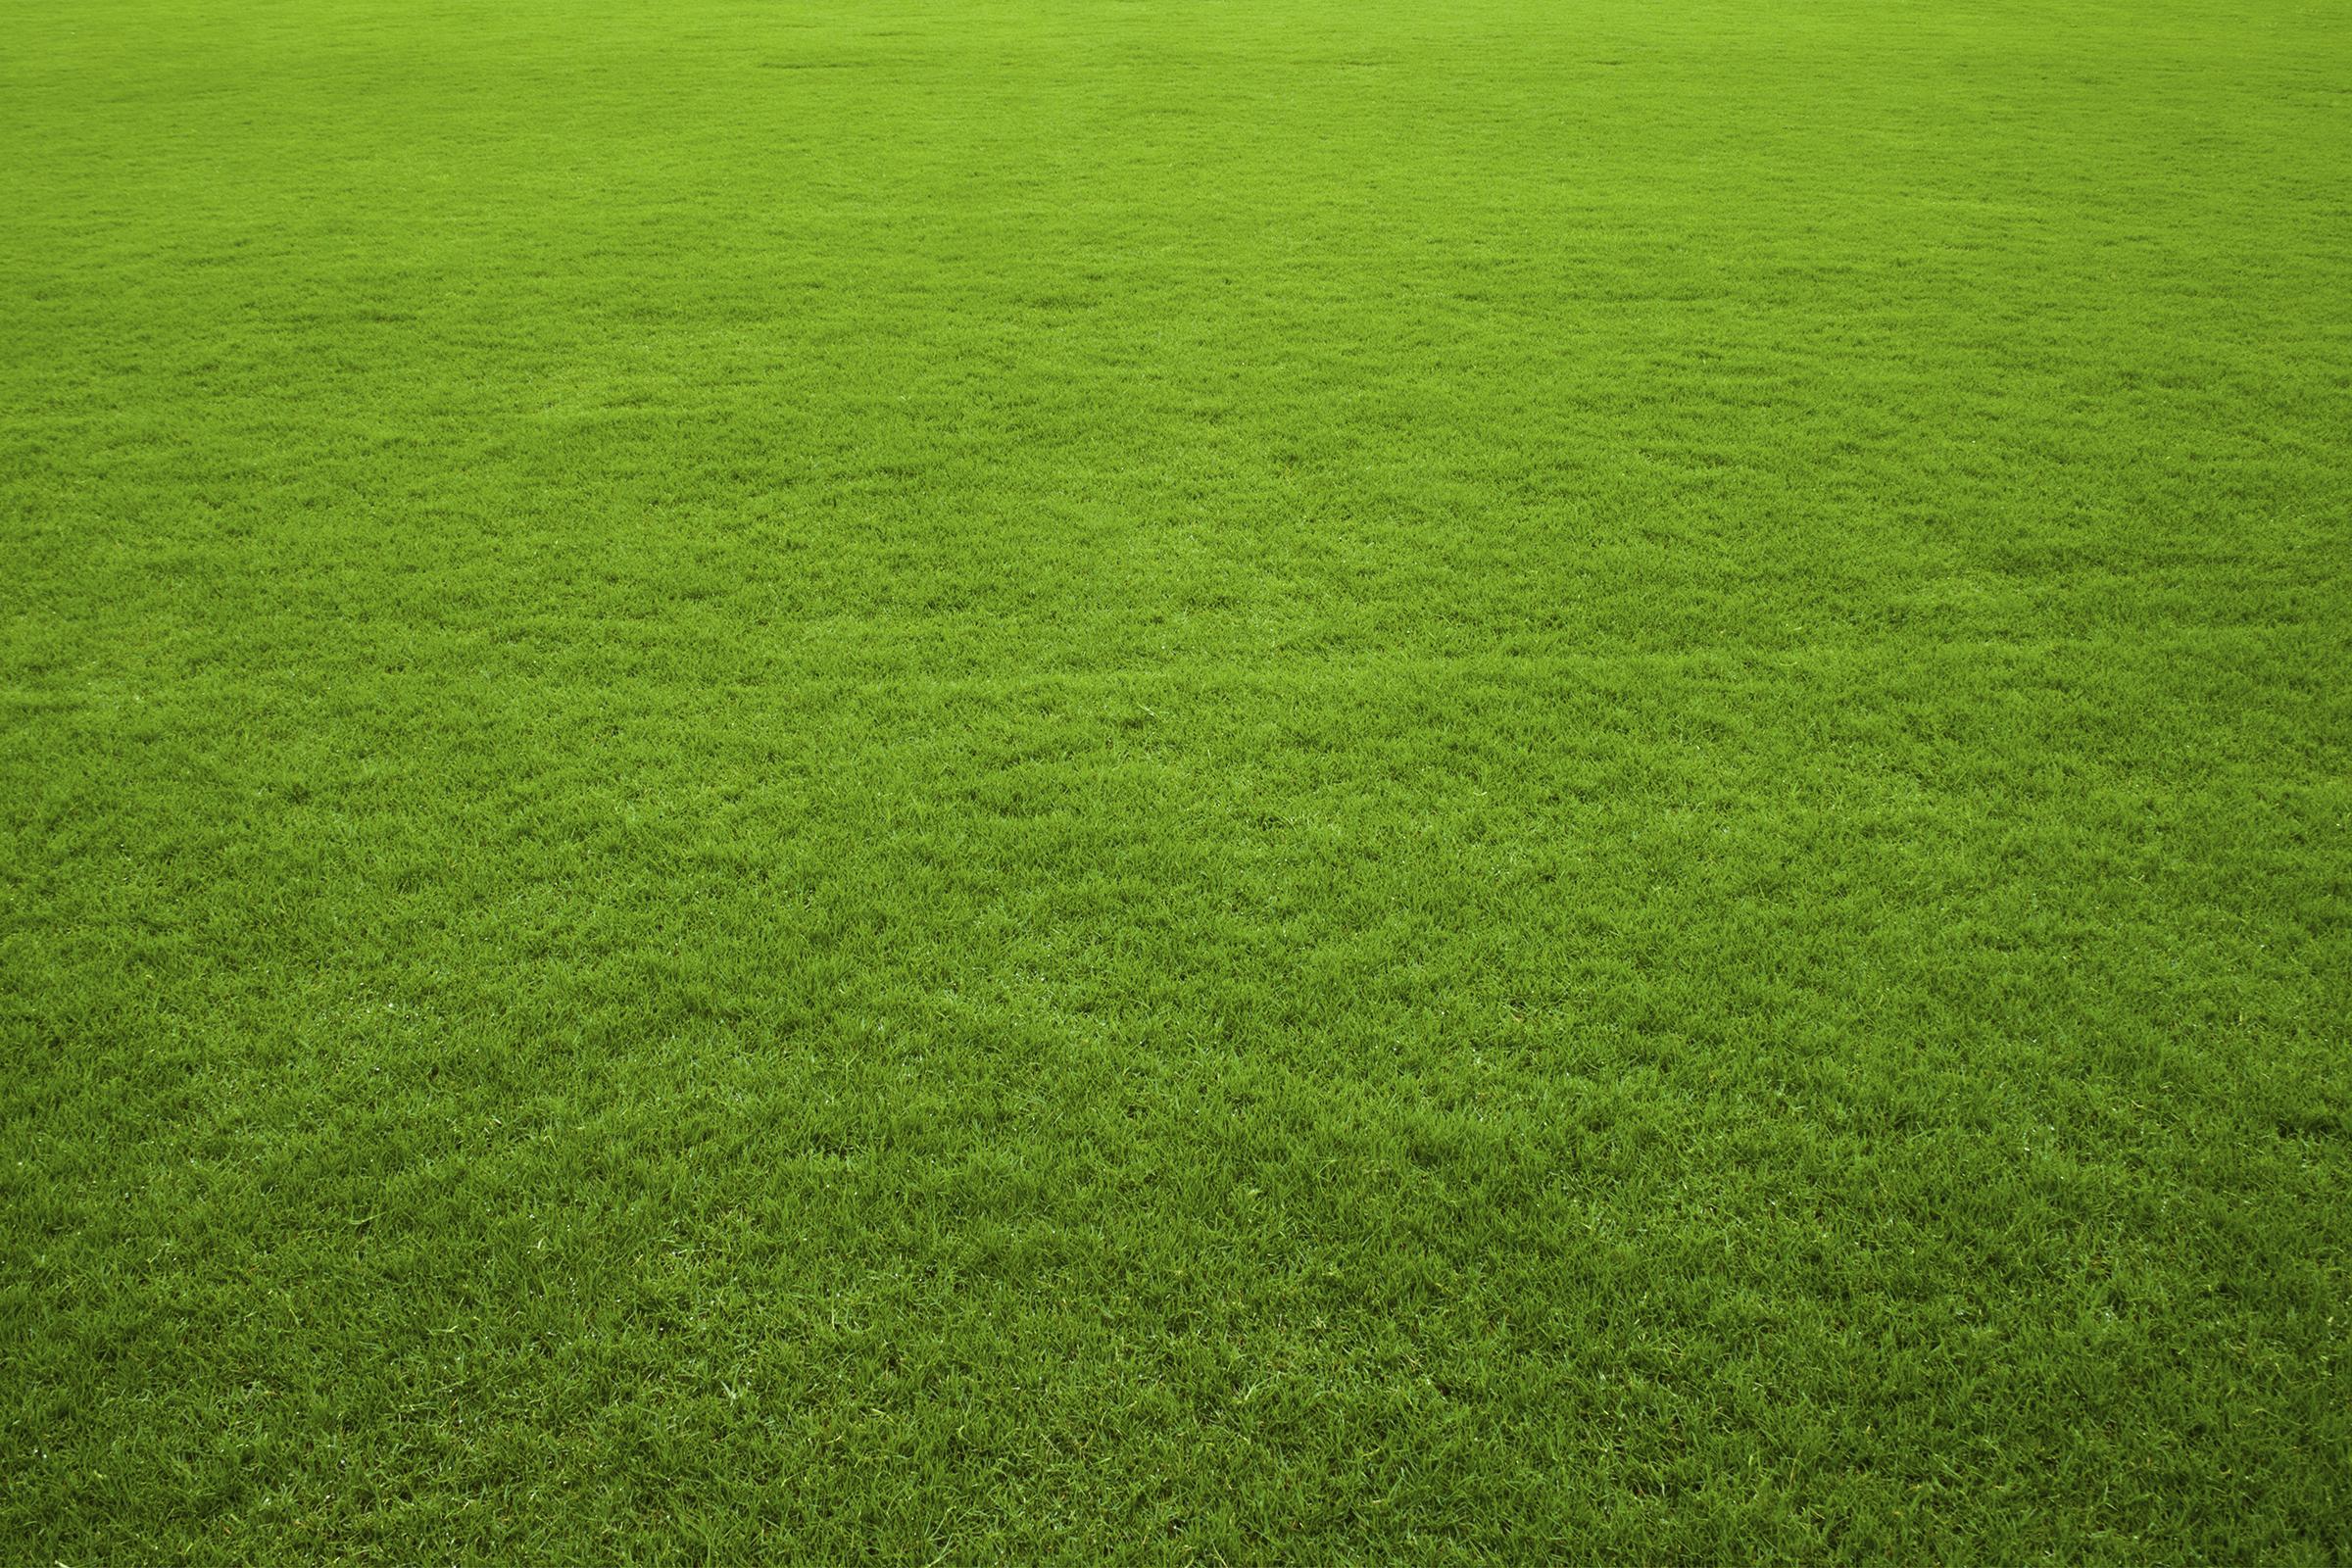 bg-grass.jpg